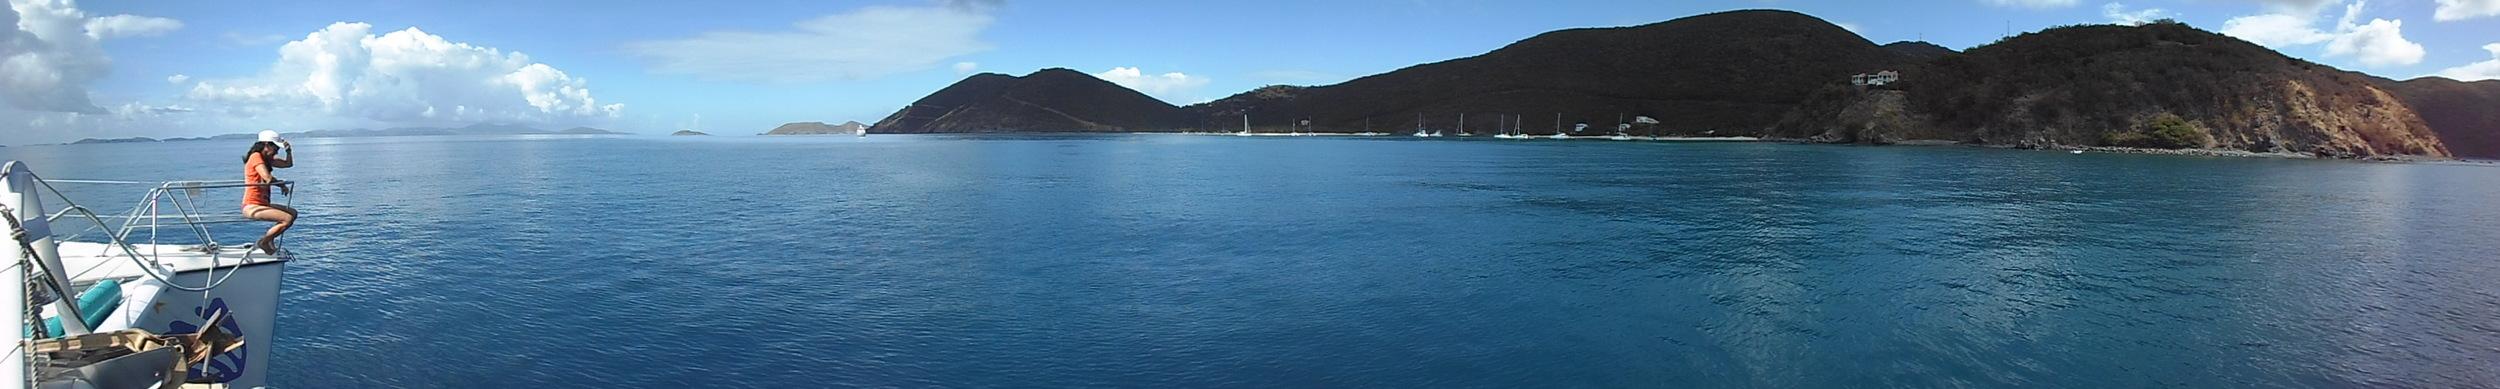 Sail around Jost Van Dyke.